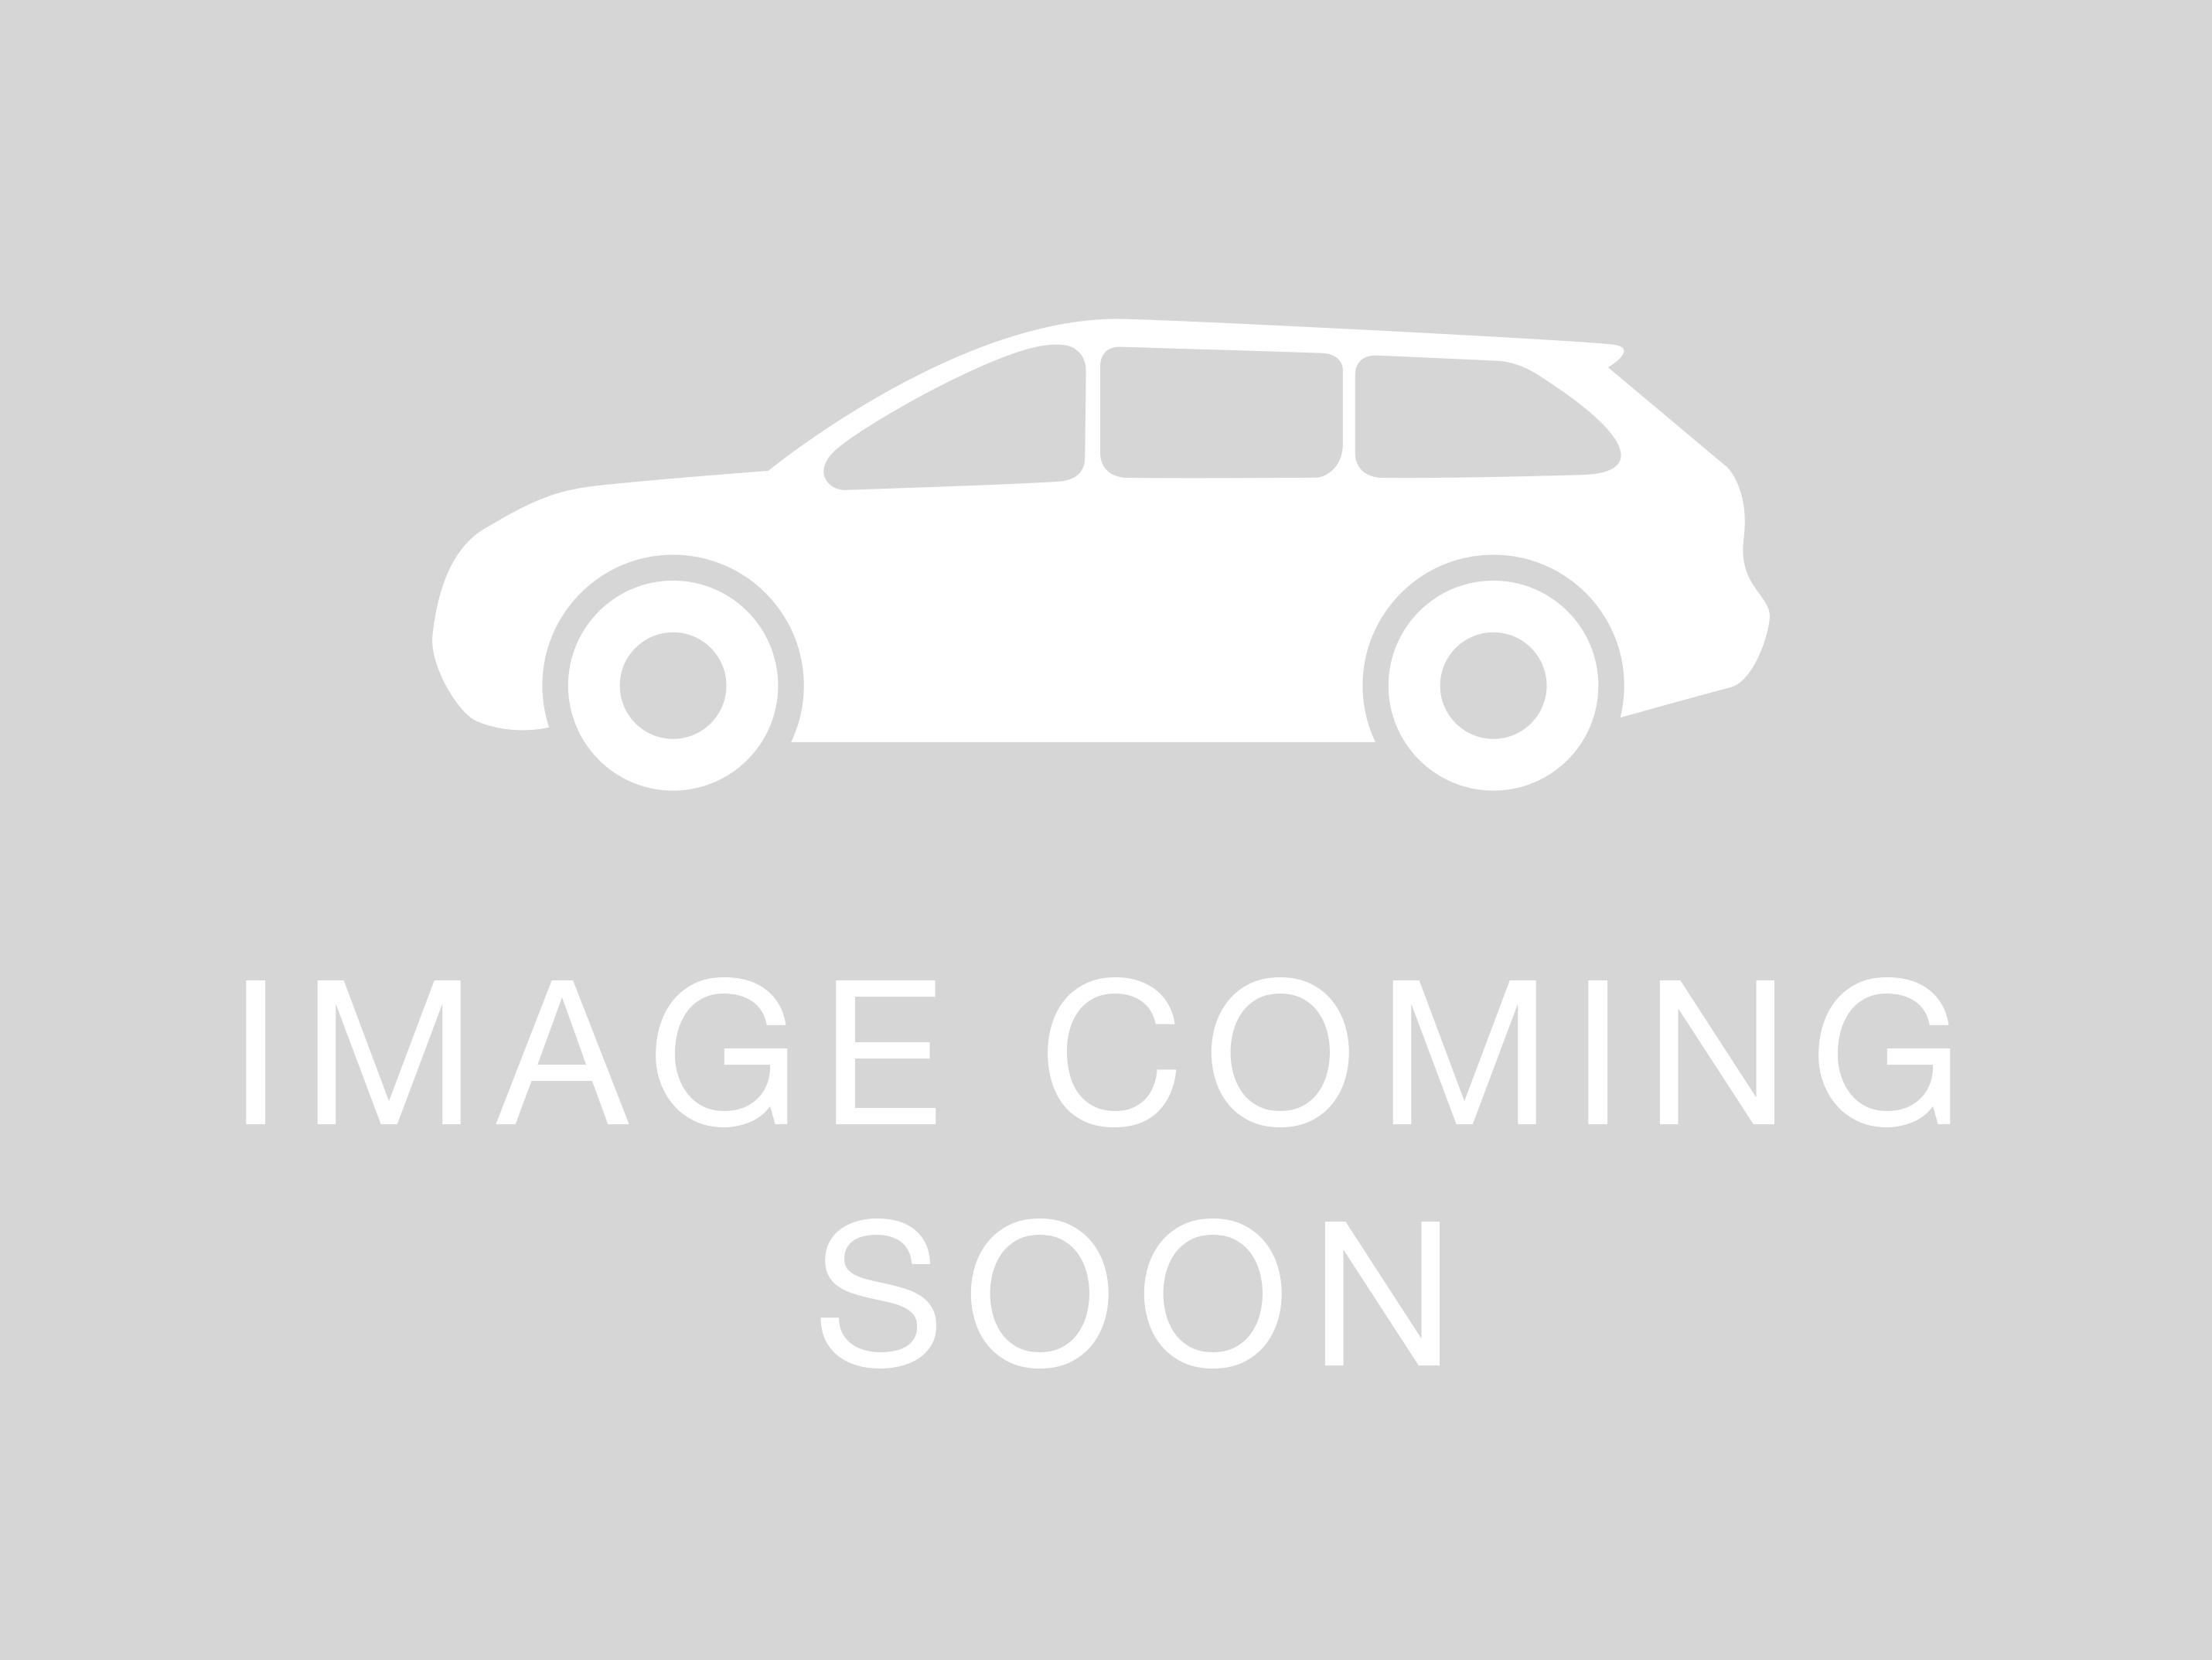 2018 Subaru Outback 2 5 Premium My18 Su108779a Winger Group Nz